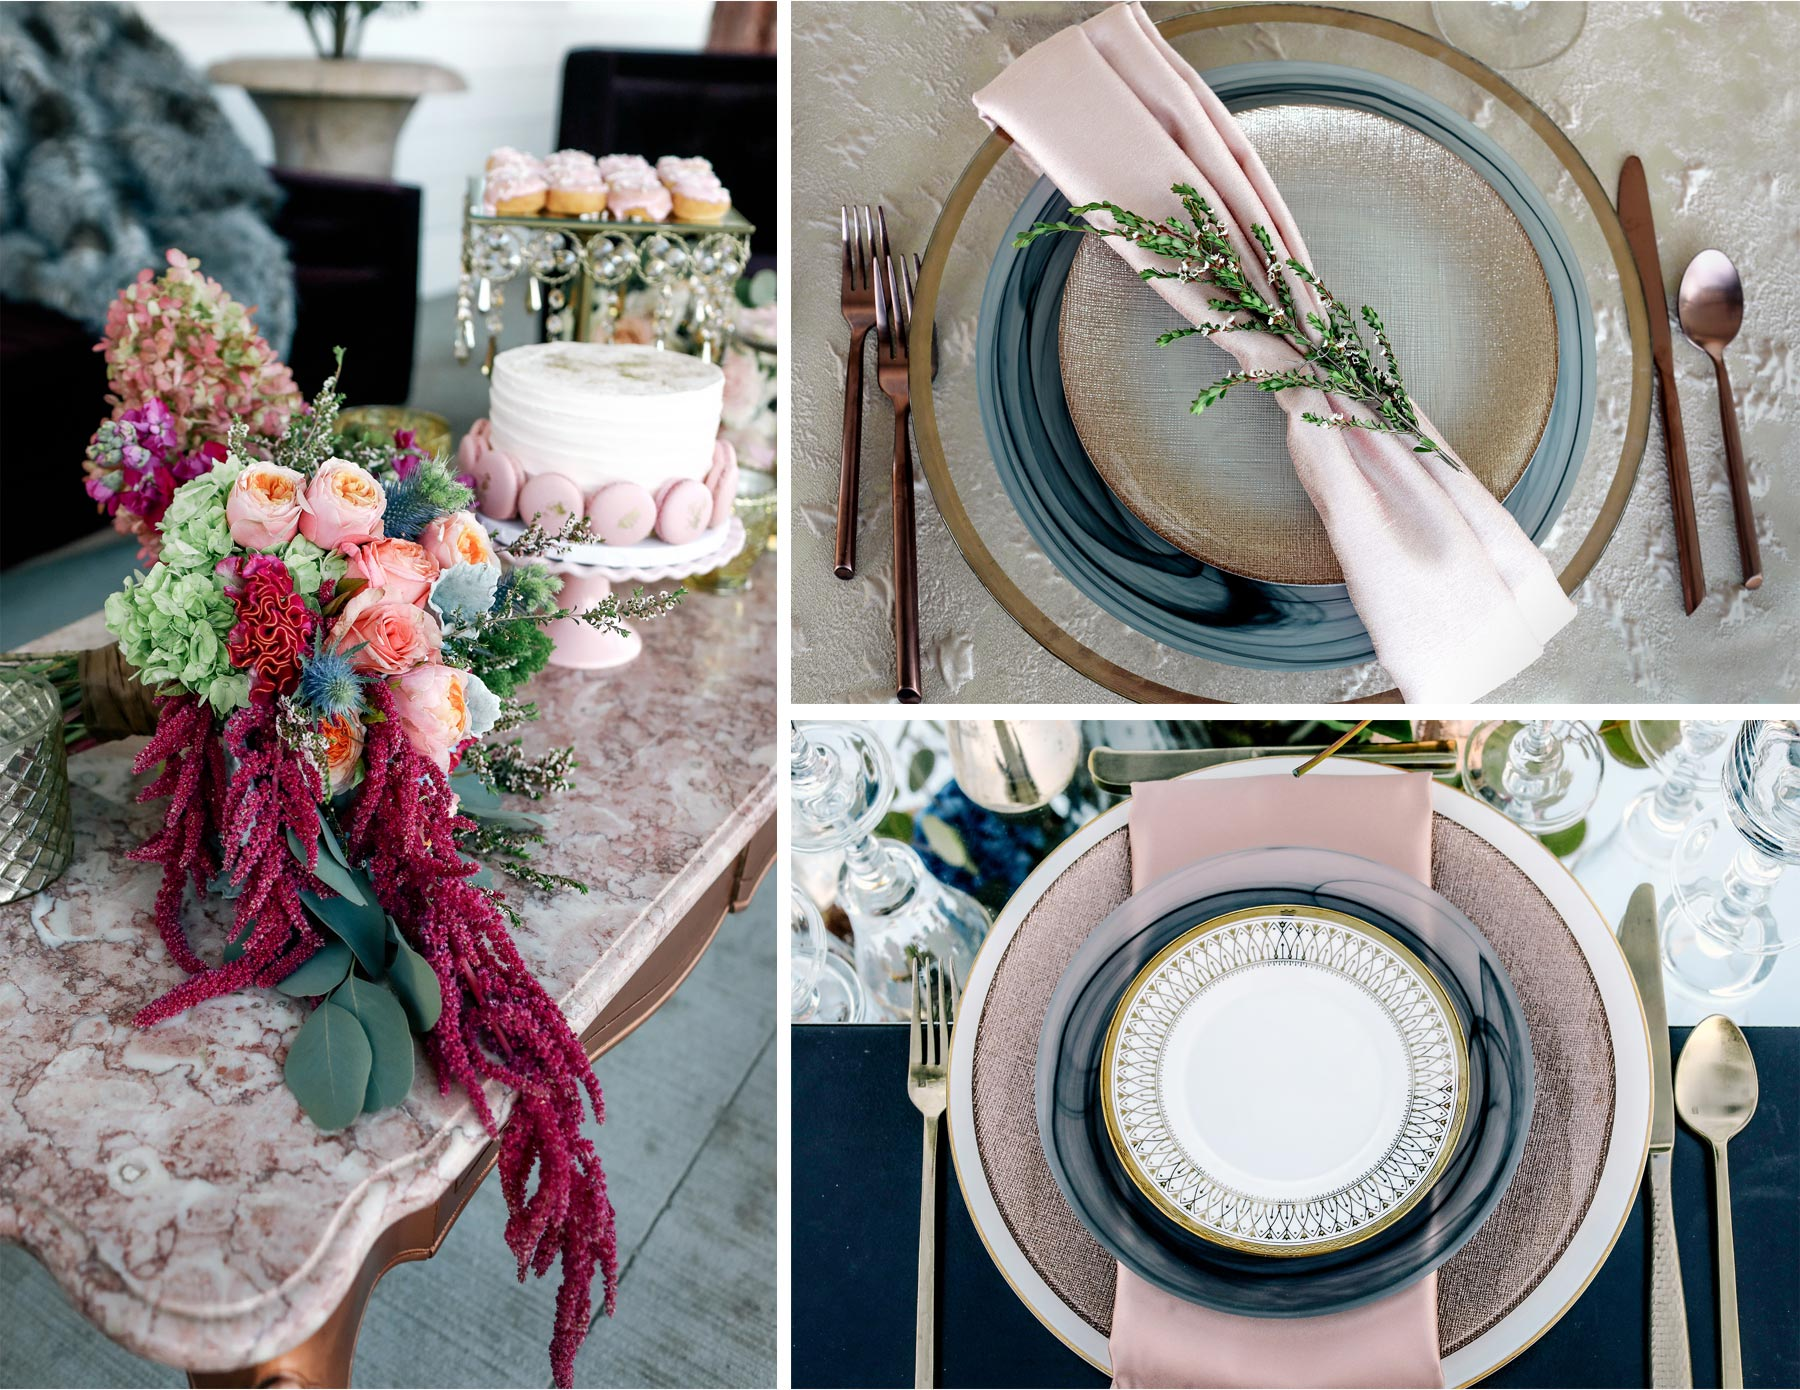 09-Ashery-Lane-Farm-Minneapolis-Minnesota-Wedding-Styled-Shoot-New-Venue-Barn-Orchard-Vineyard-Dinner-Place-Setting-Plates-Decor.jpg